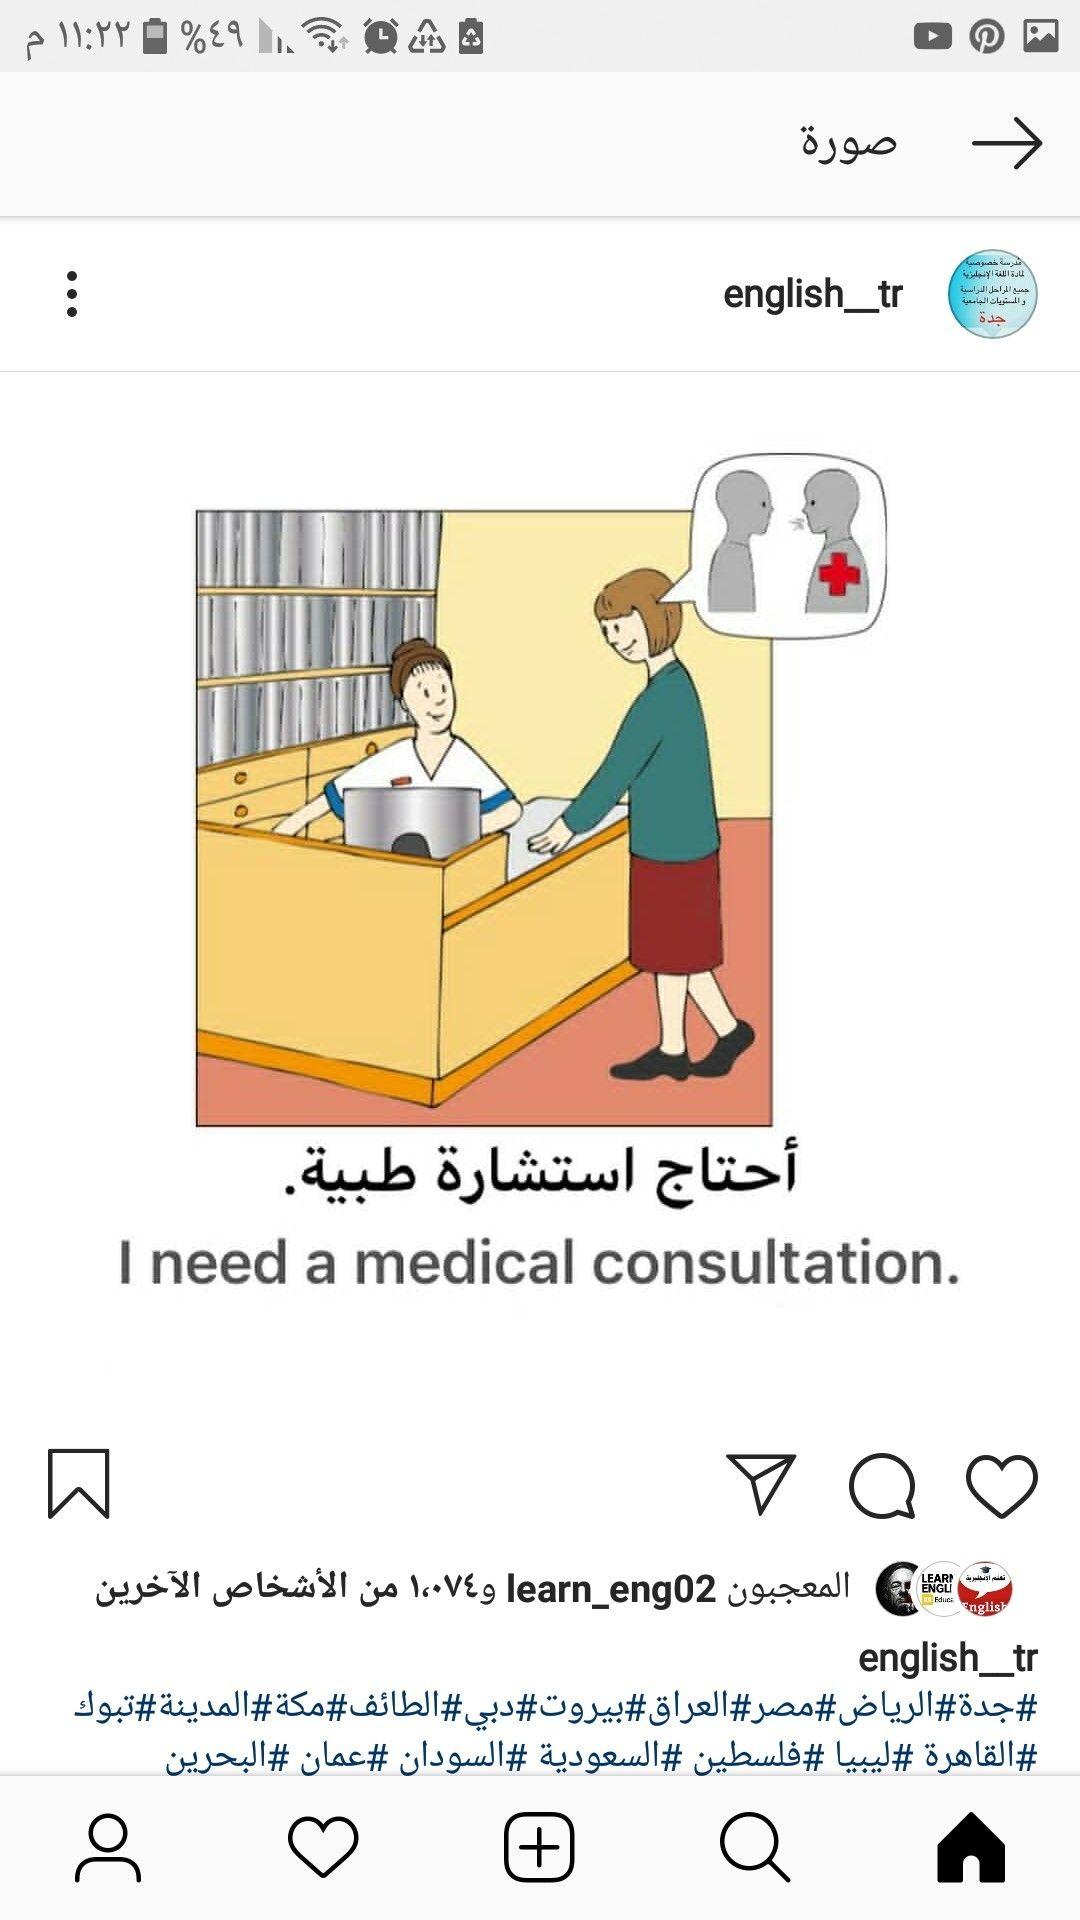 Pin By Layali Othman On English Wards English Language Learning Grammar English Language Teaching English Phrases